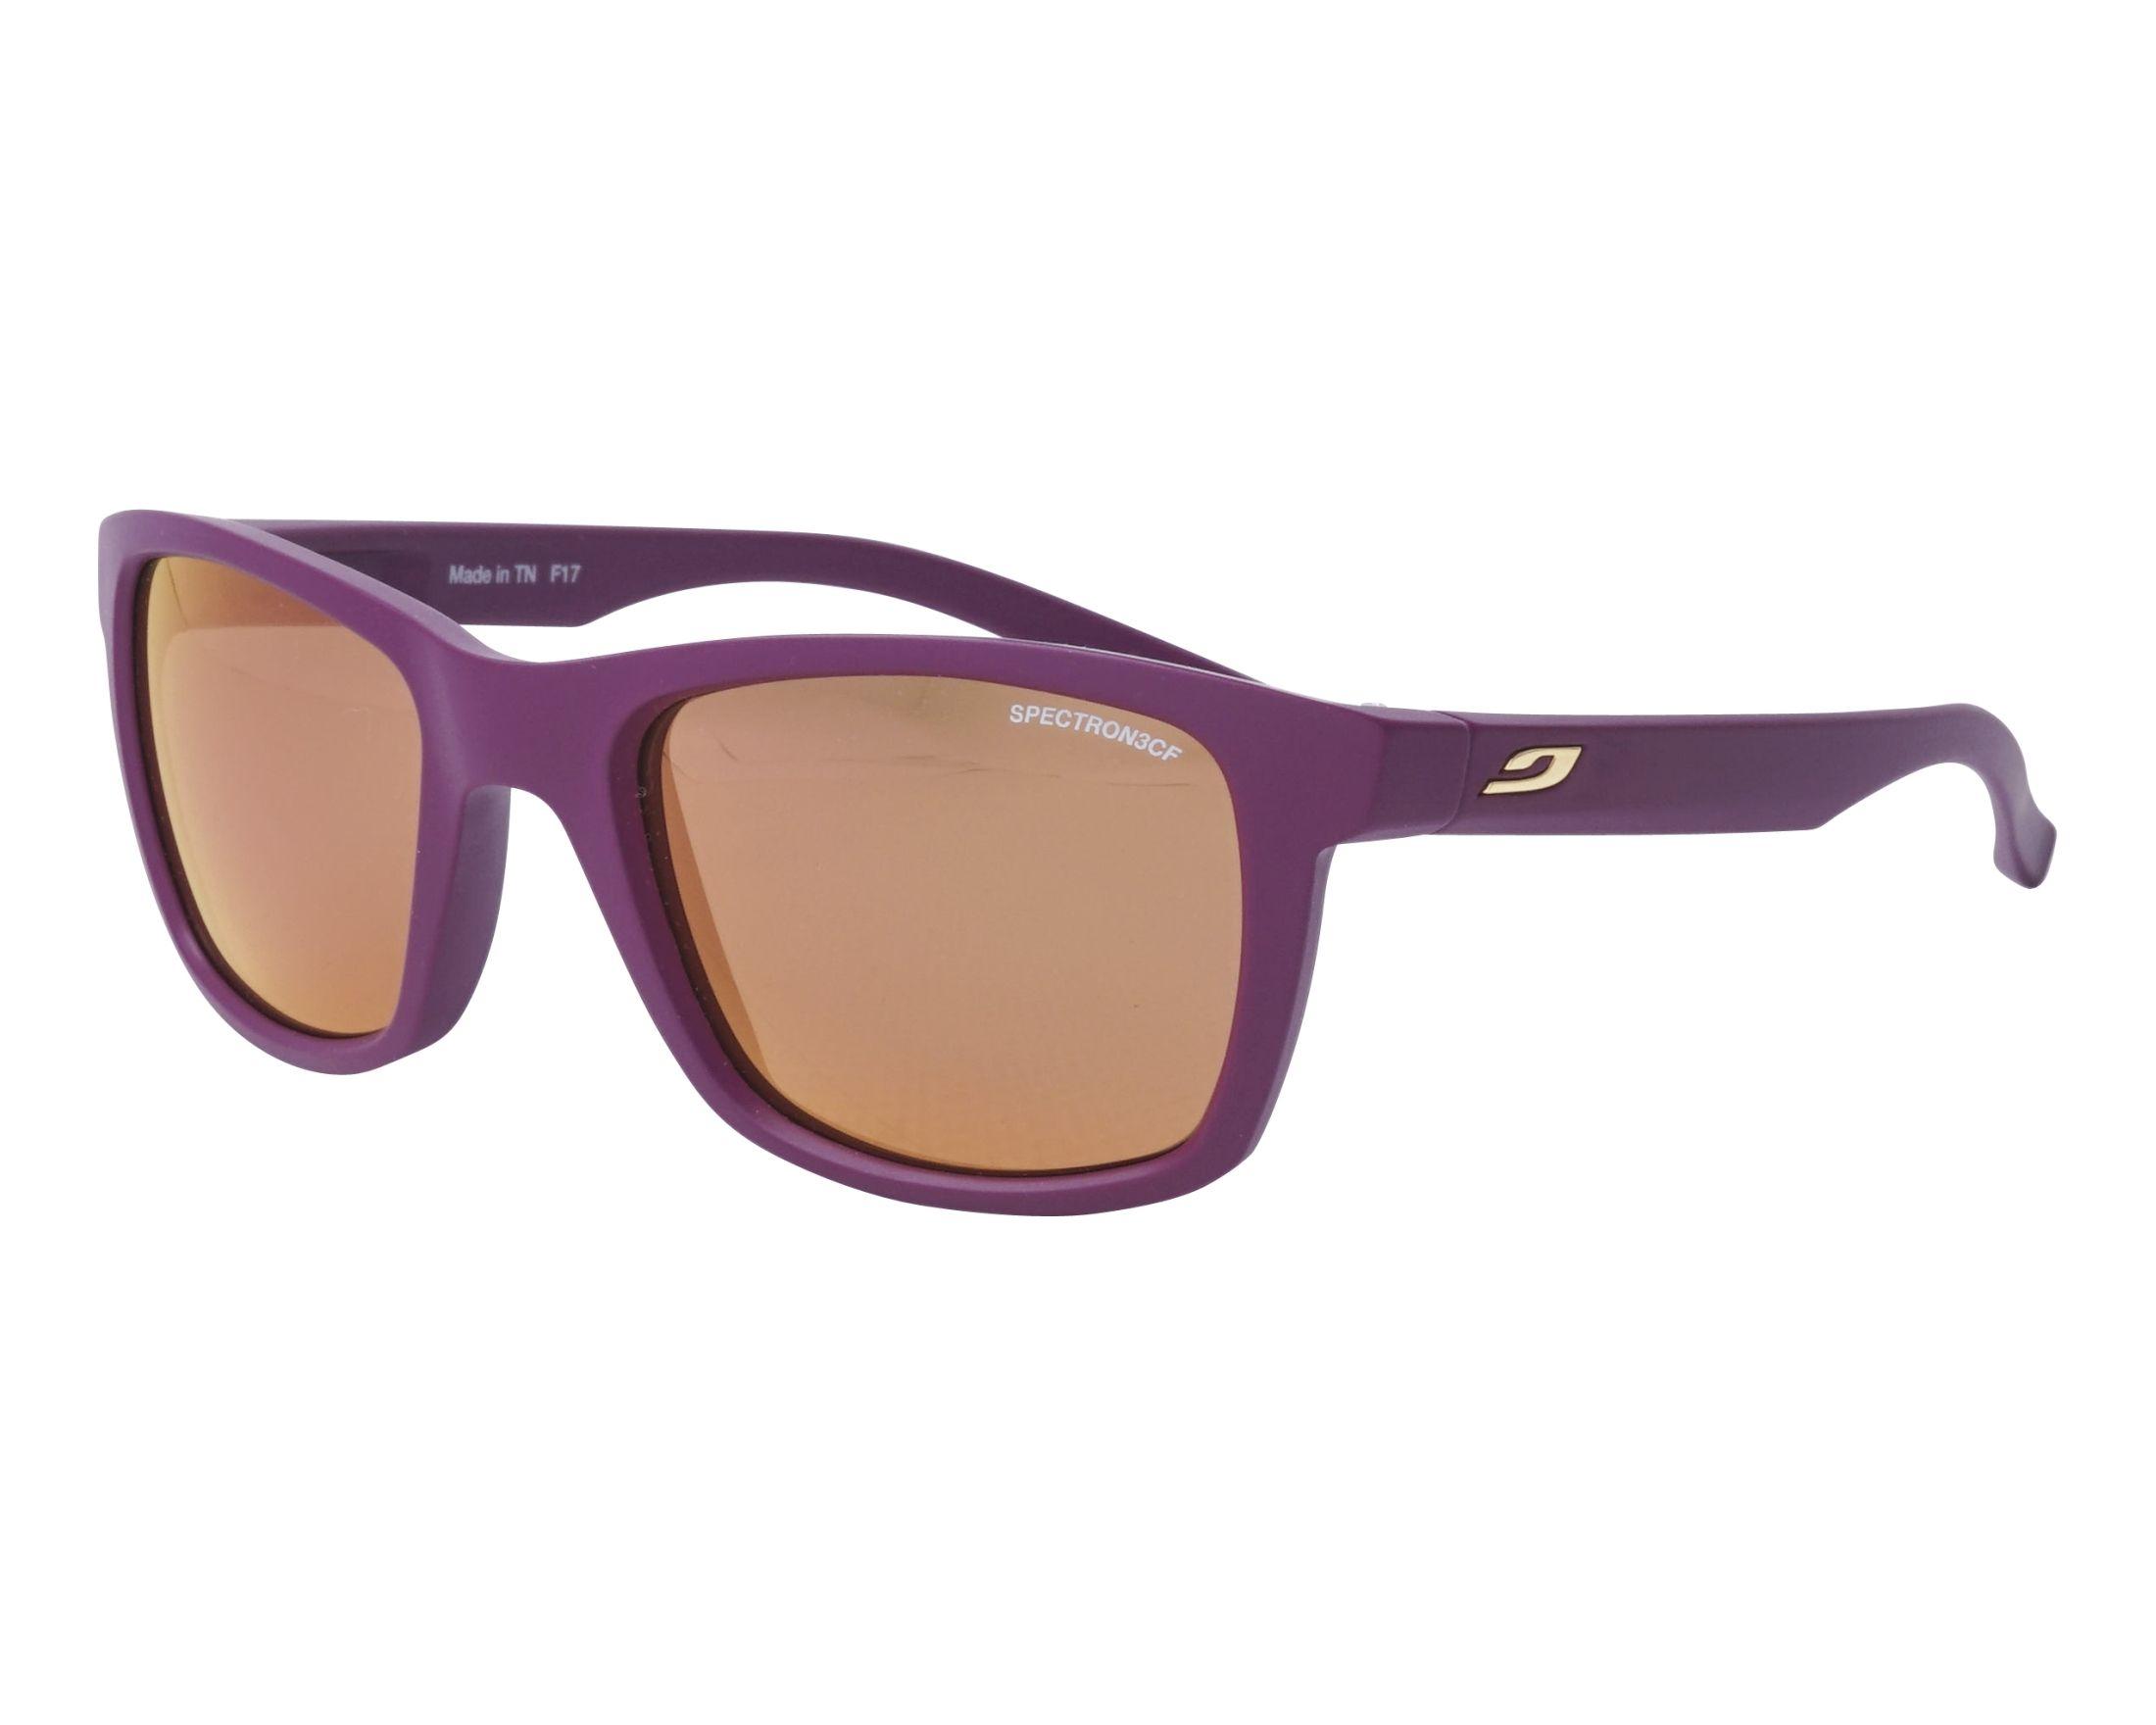 a9e299ec3a thumbnail Sunglasses Julbo J477 1126 50-19 Purple profile view